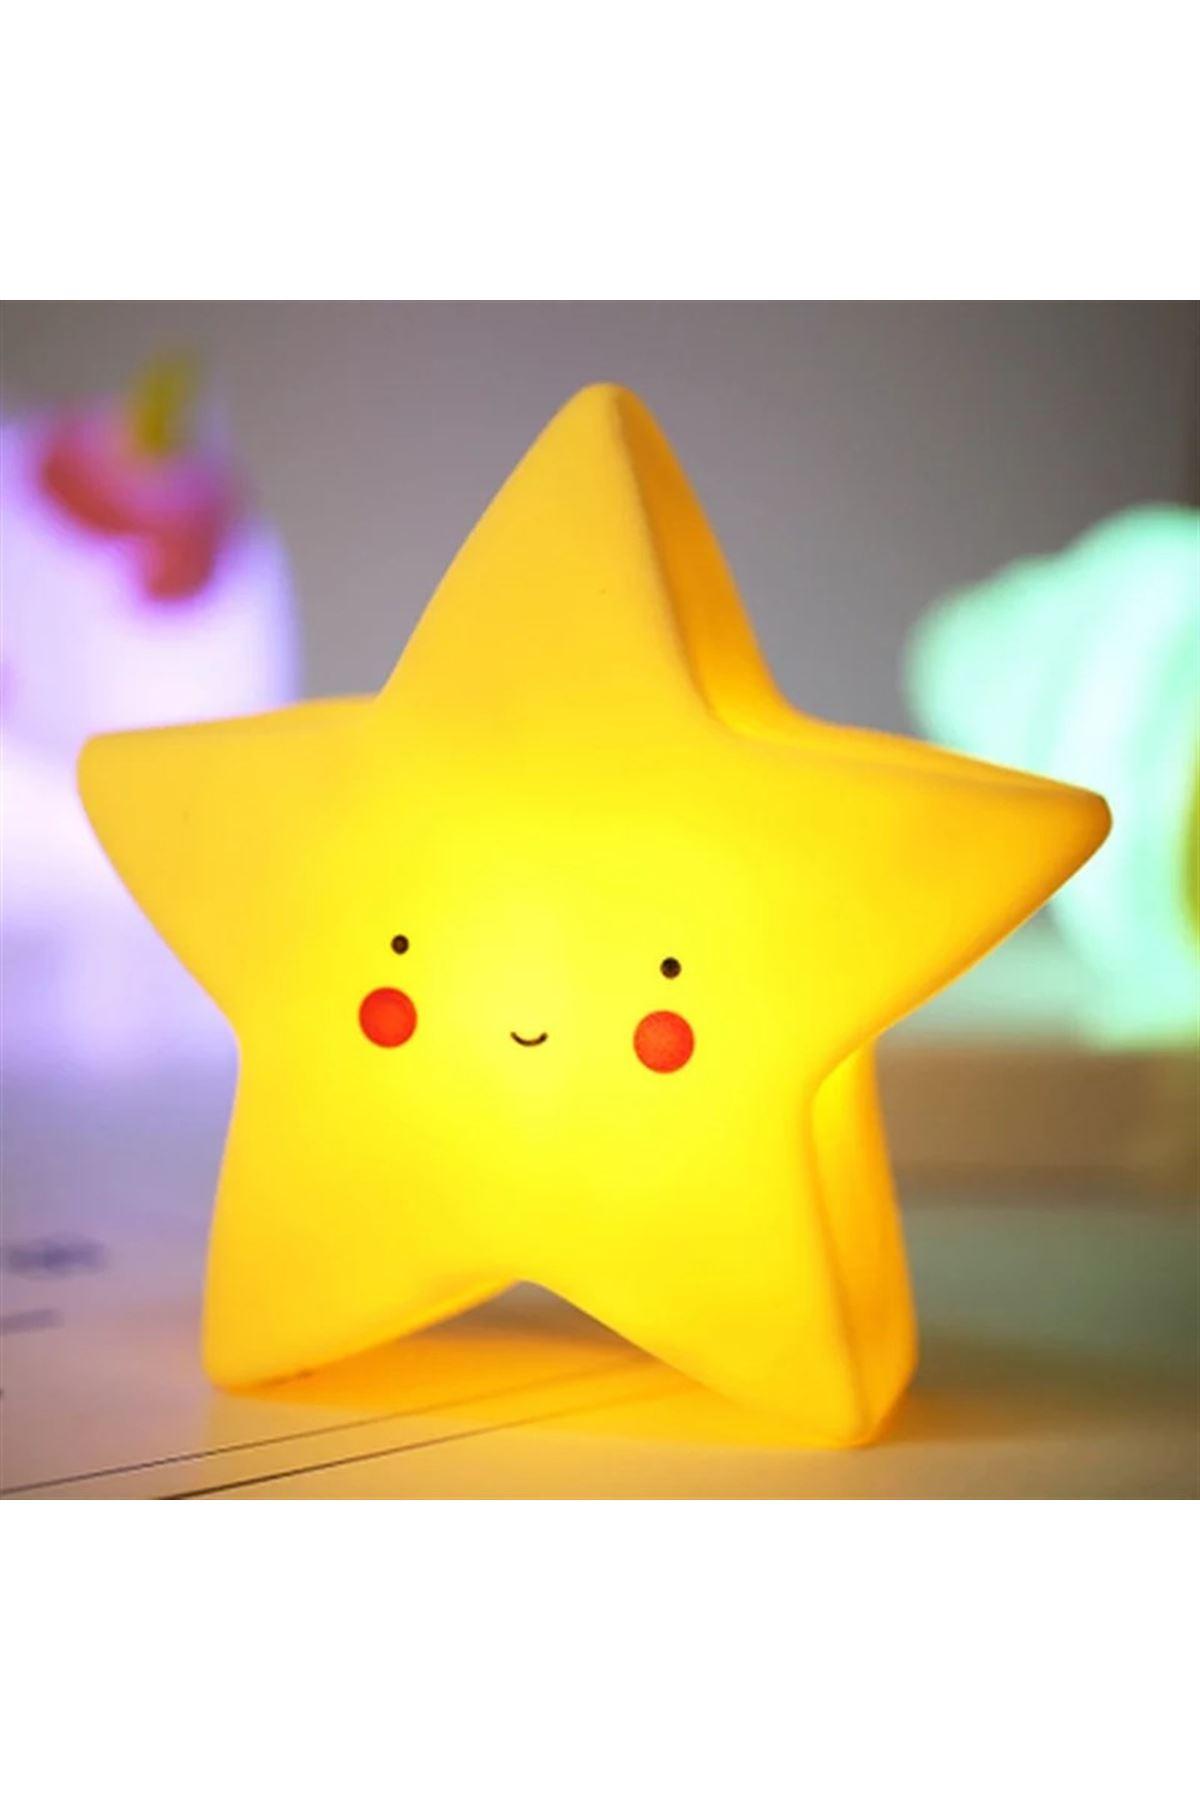 YILDIZ IŞIK - STAR LİGHT - SARI